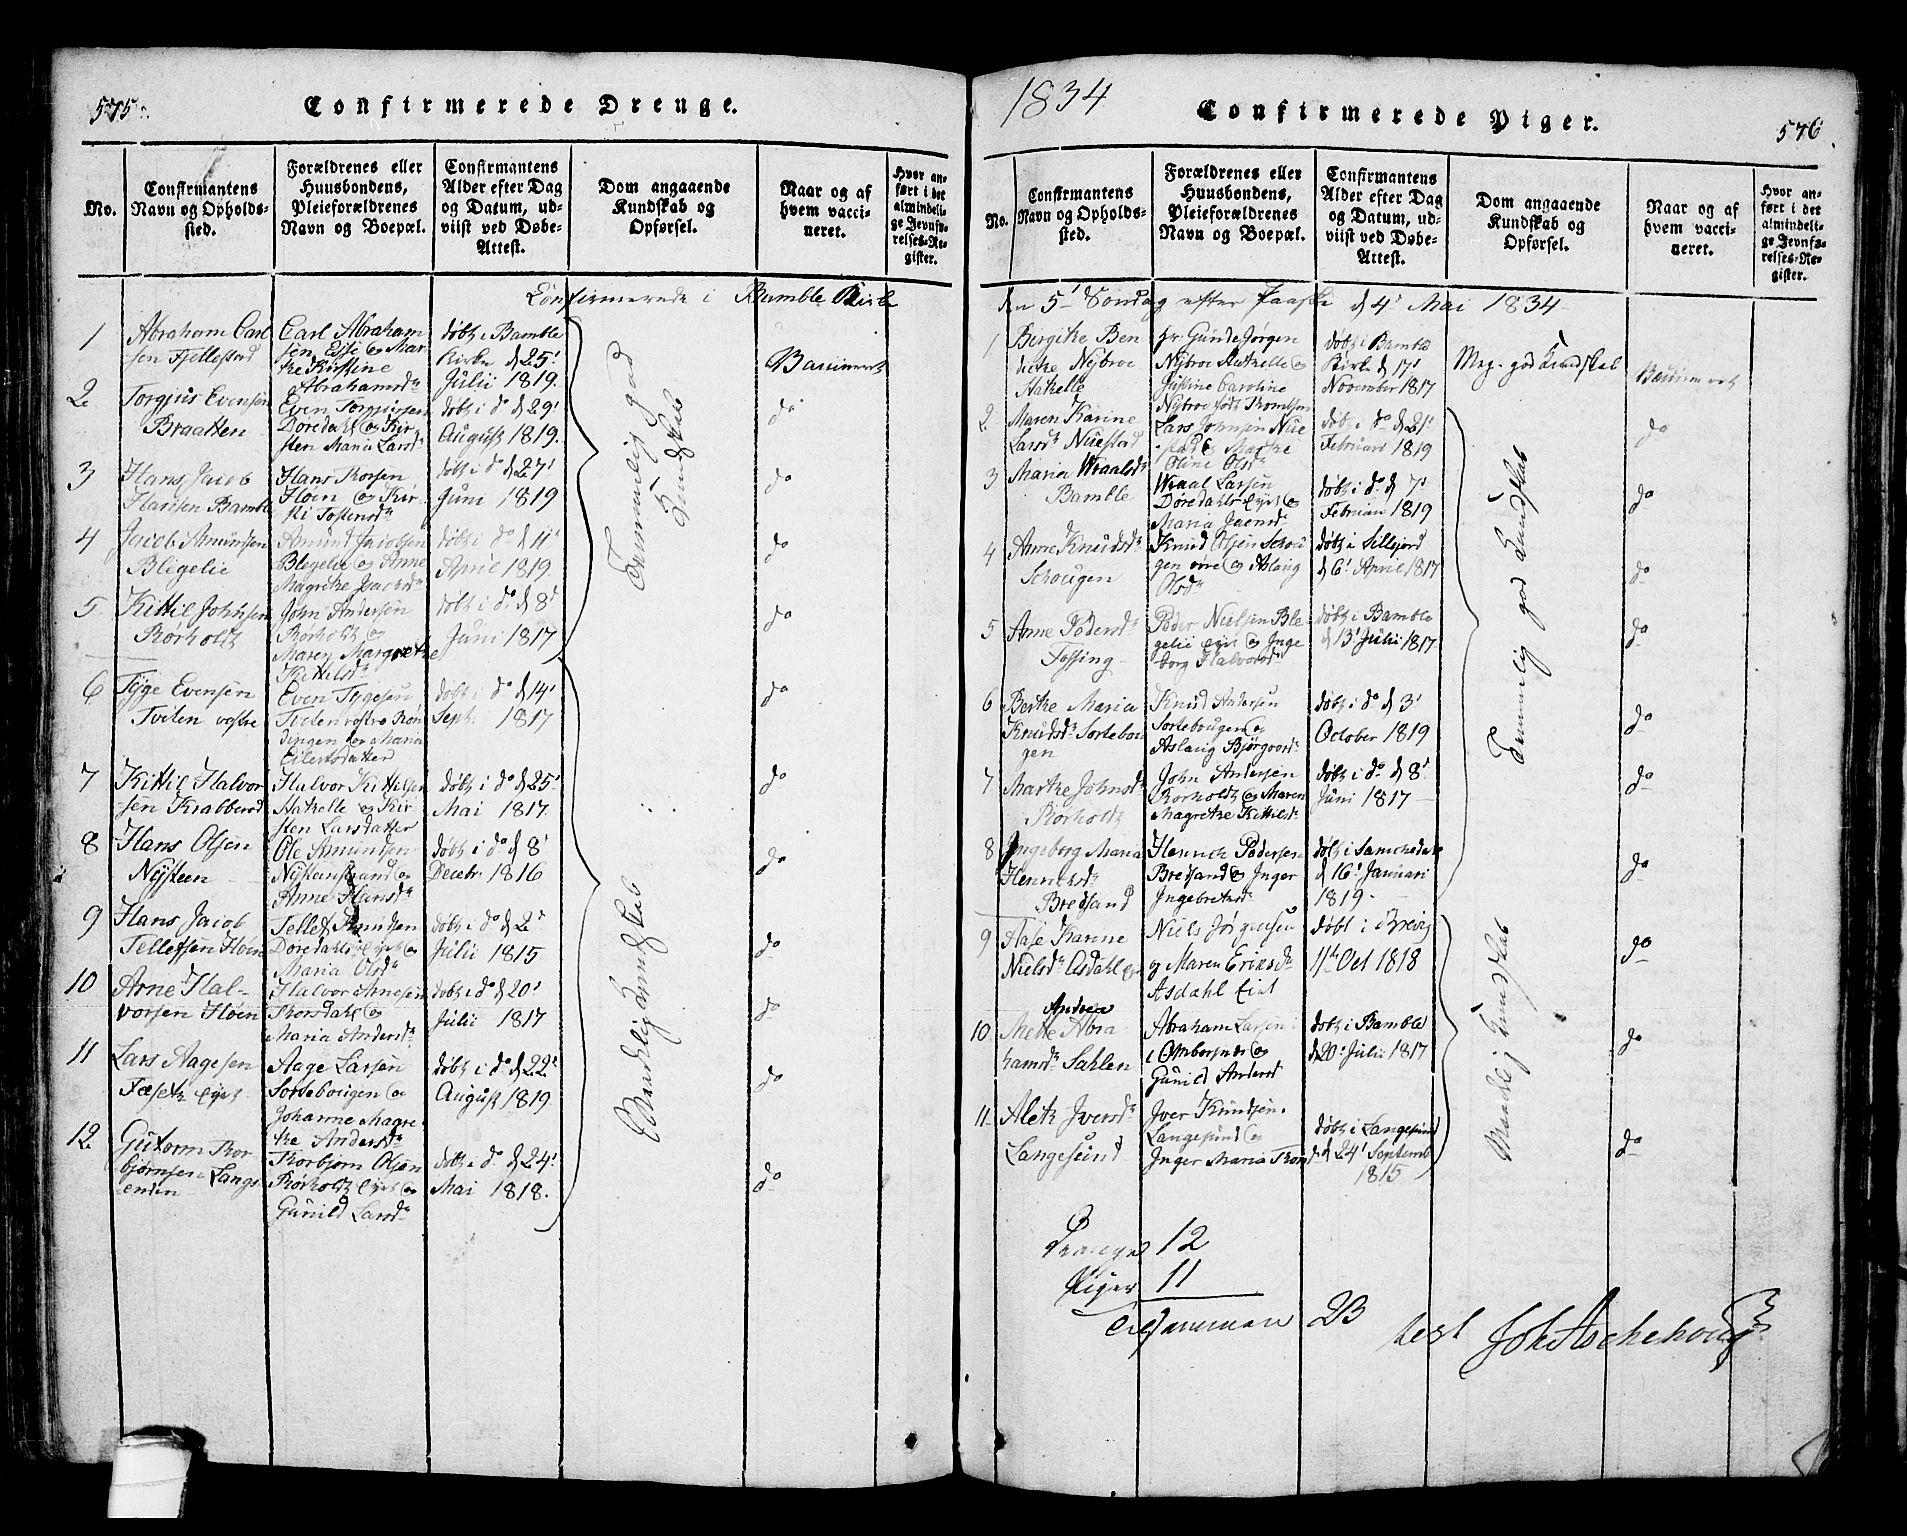 SAKO, Bamble kirkebøker, F/Fa/L0003: Ministerialbok nr. I 3 /1, 1814-1834, s. 575-576